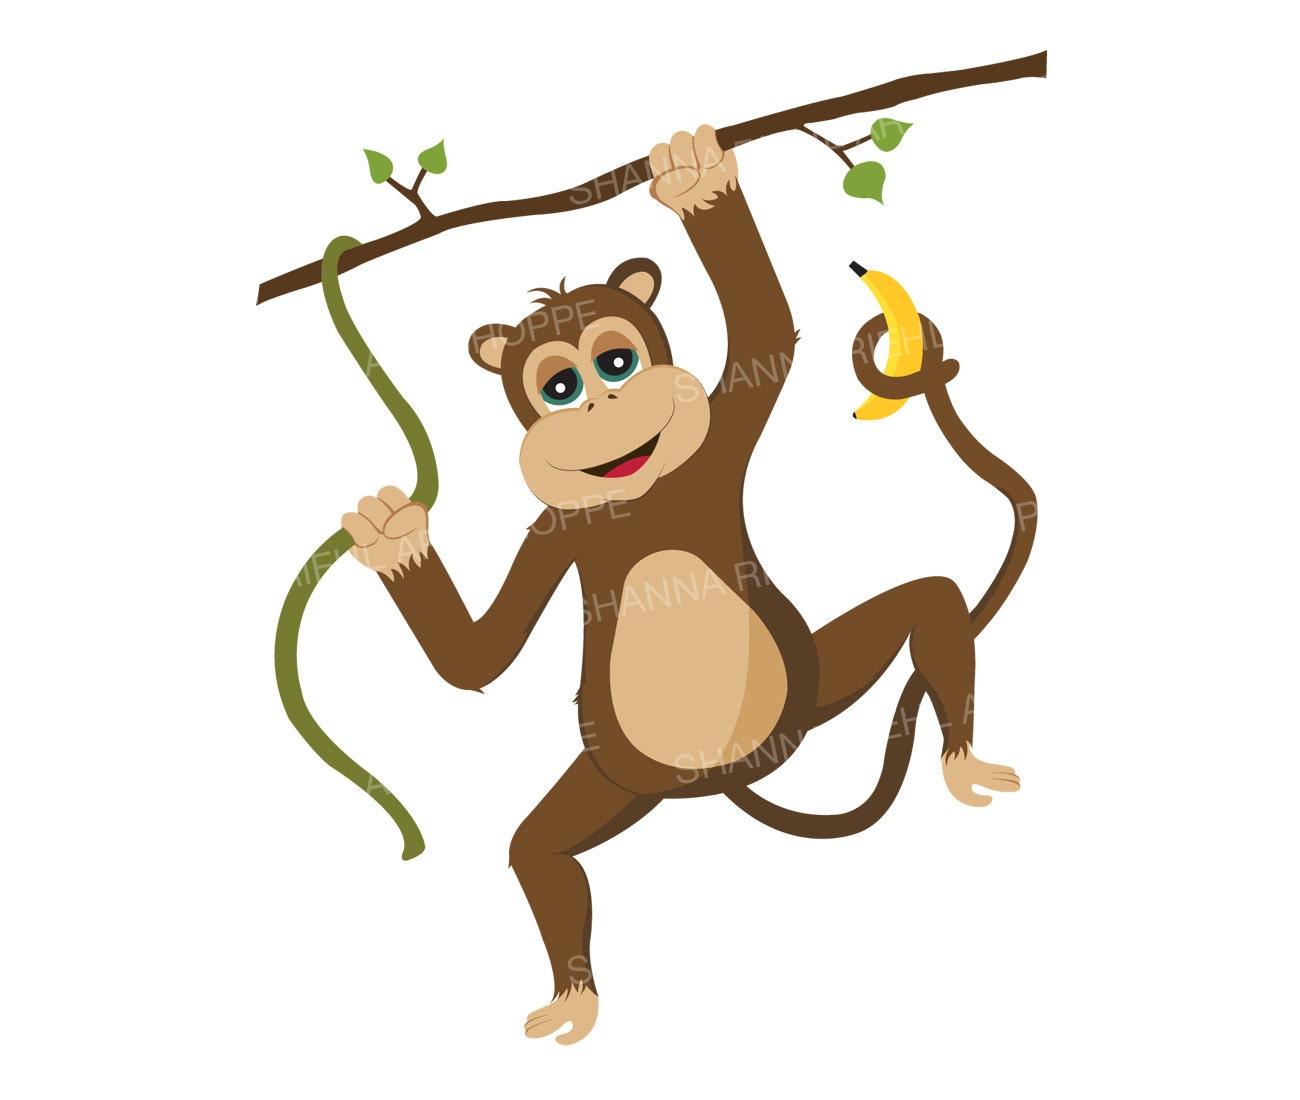 monkey clipart safari animals printable art commercial use rh etsy com baby jungle animal clipart free